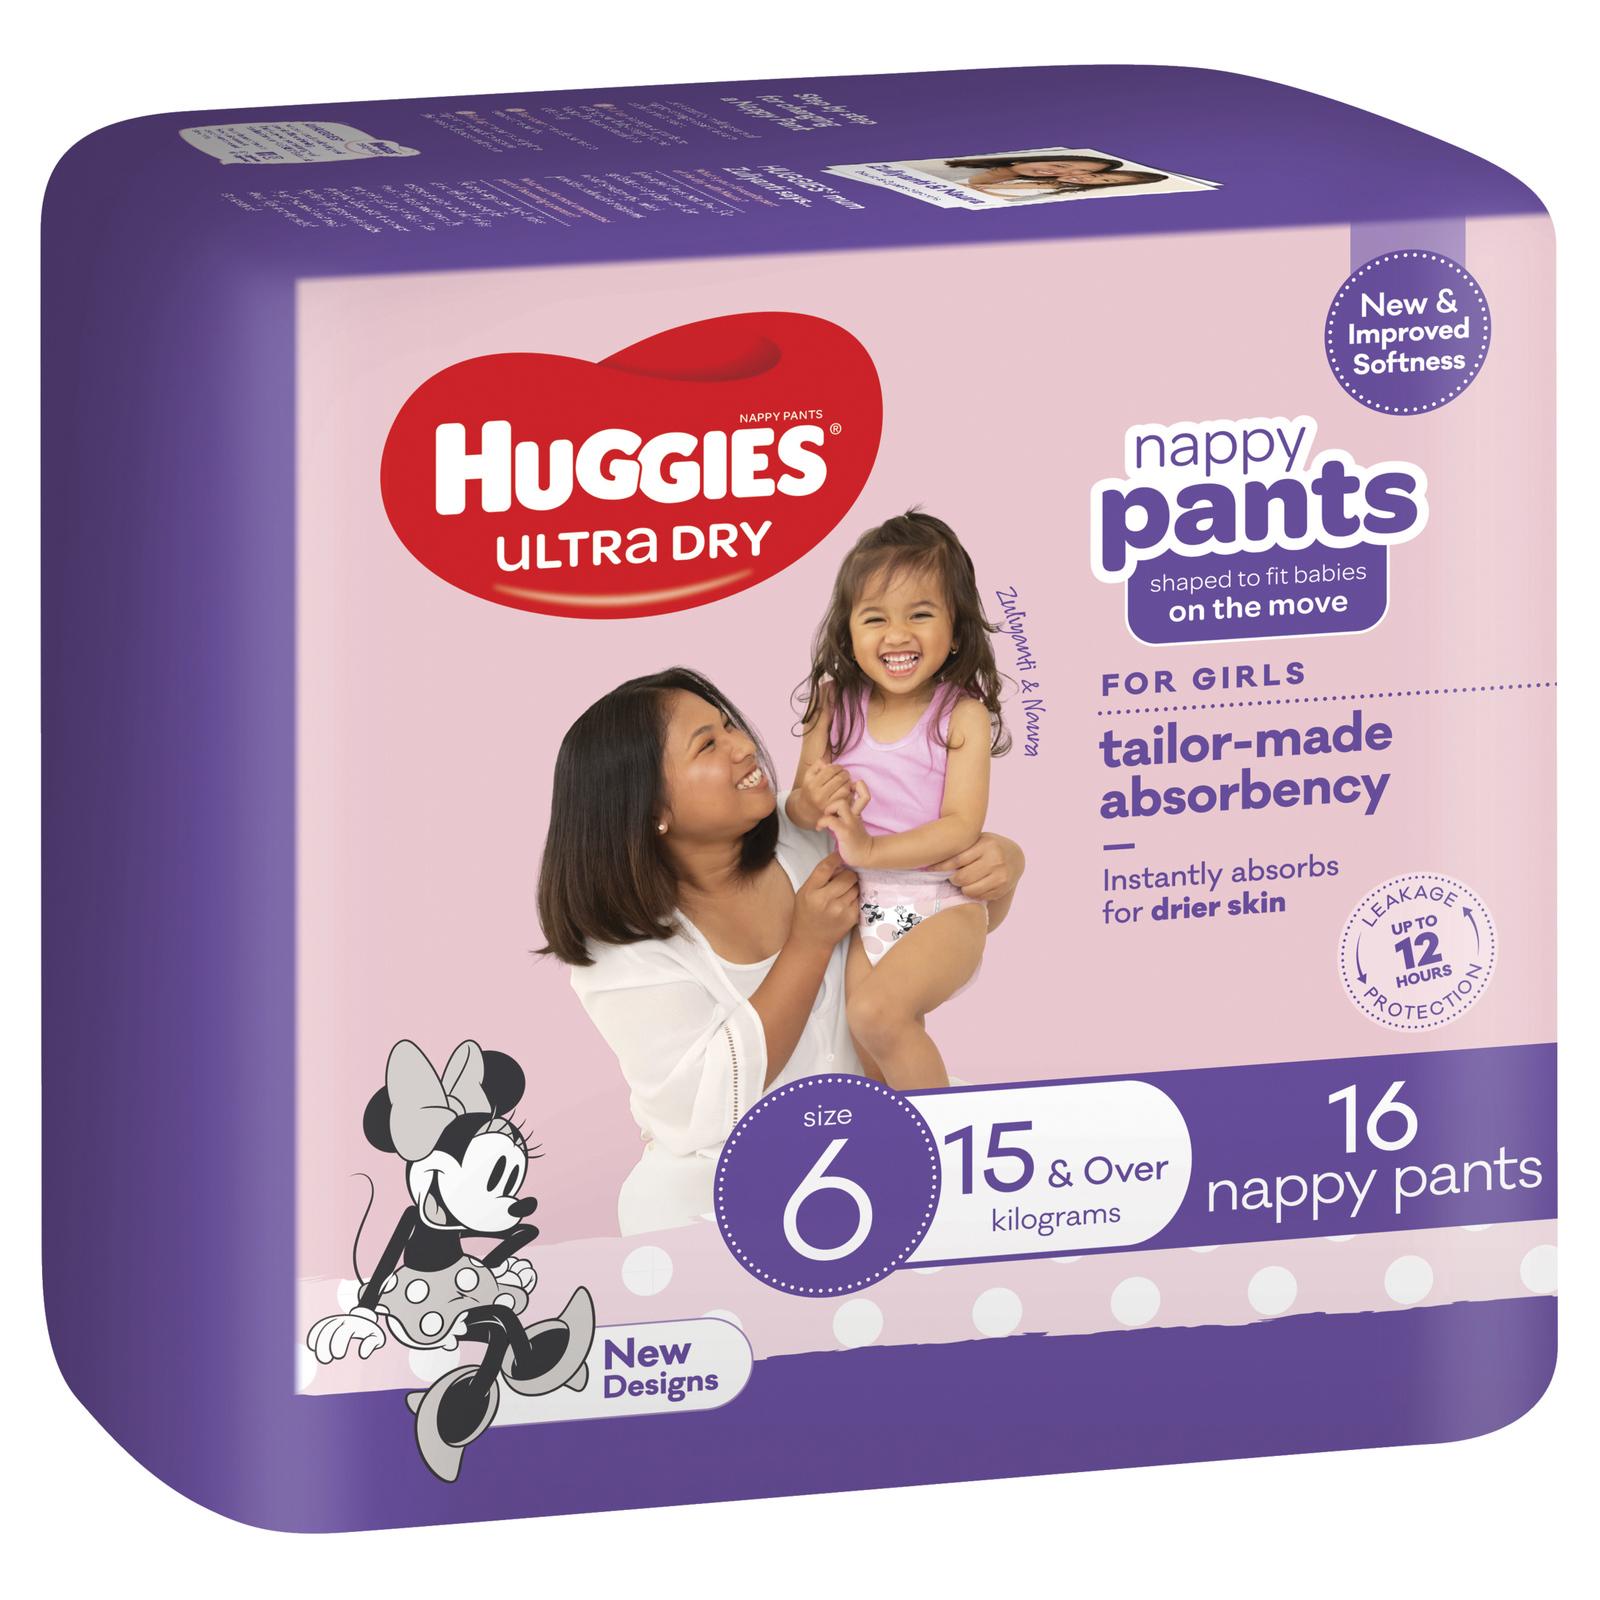 Huggies: Ultra Dry Nappy Girl Pants - Size 6 image